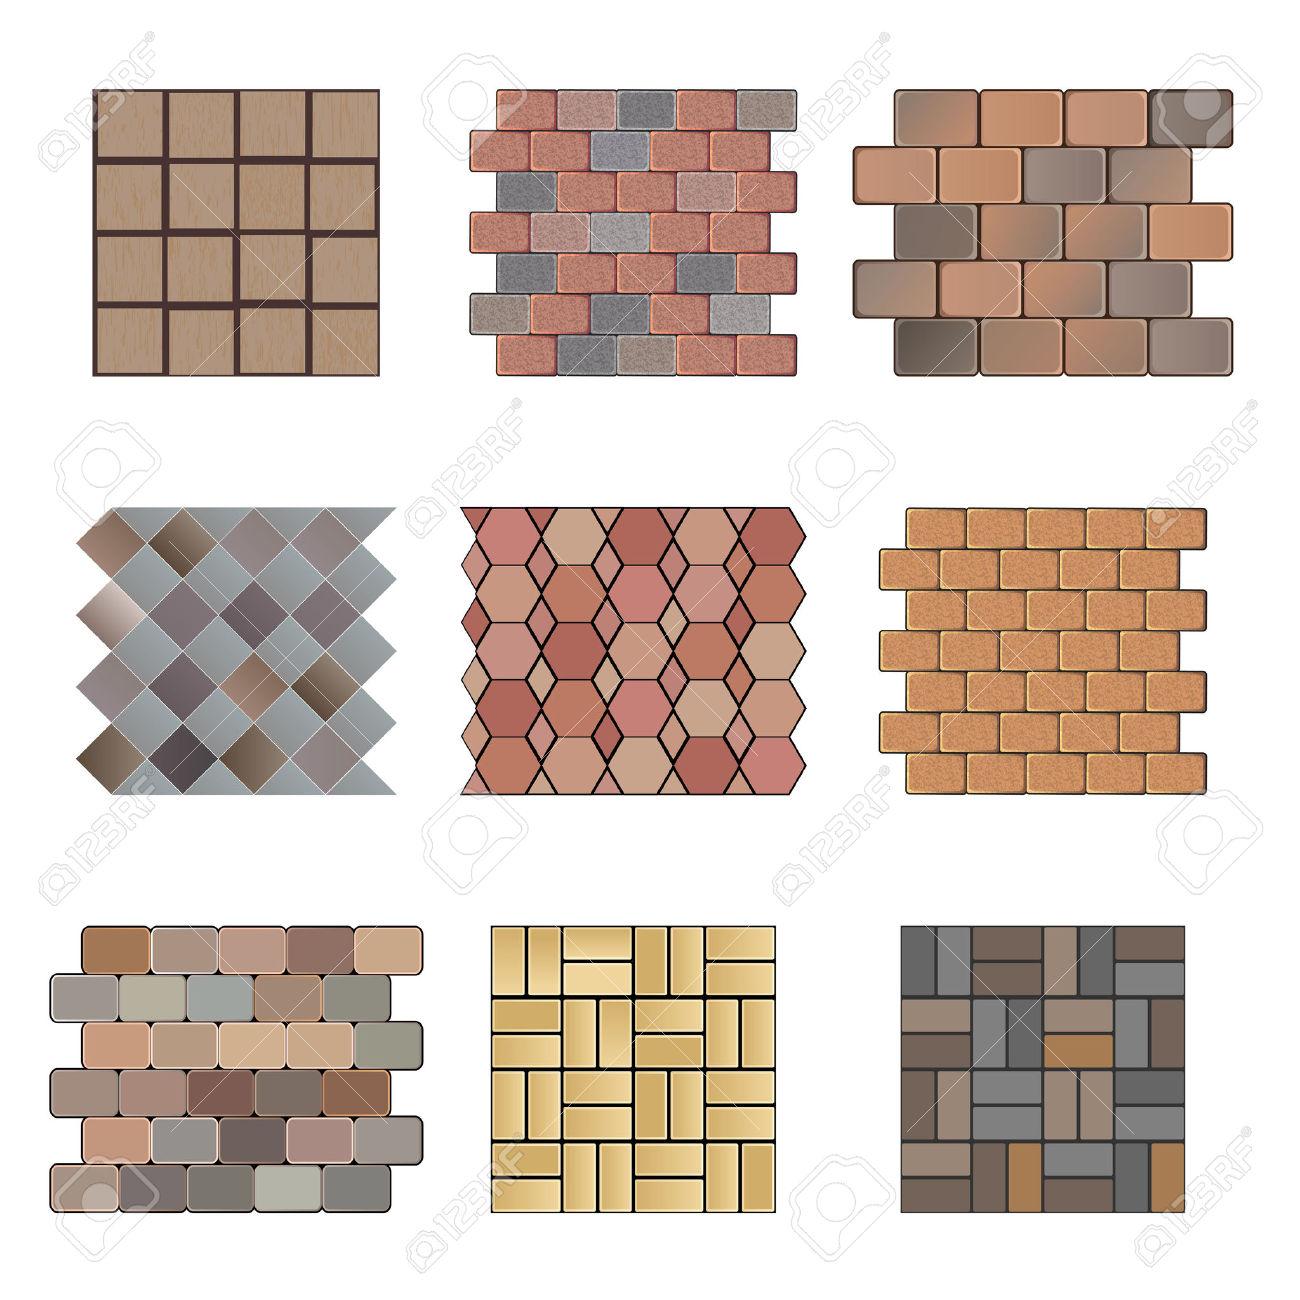 +64 Contoh Gambar Desain Paving Block Minimalis Modern Terbaru